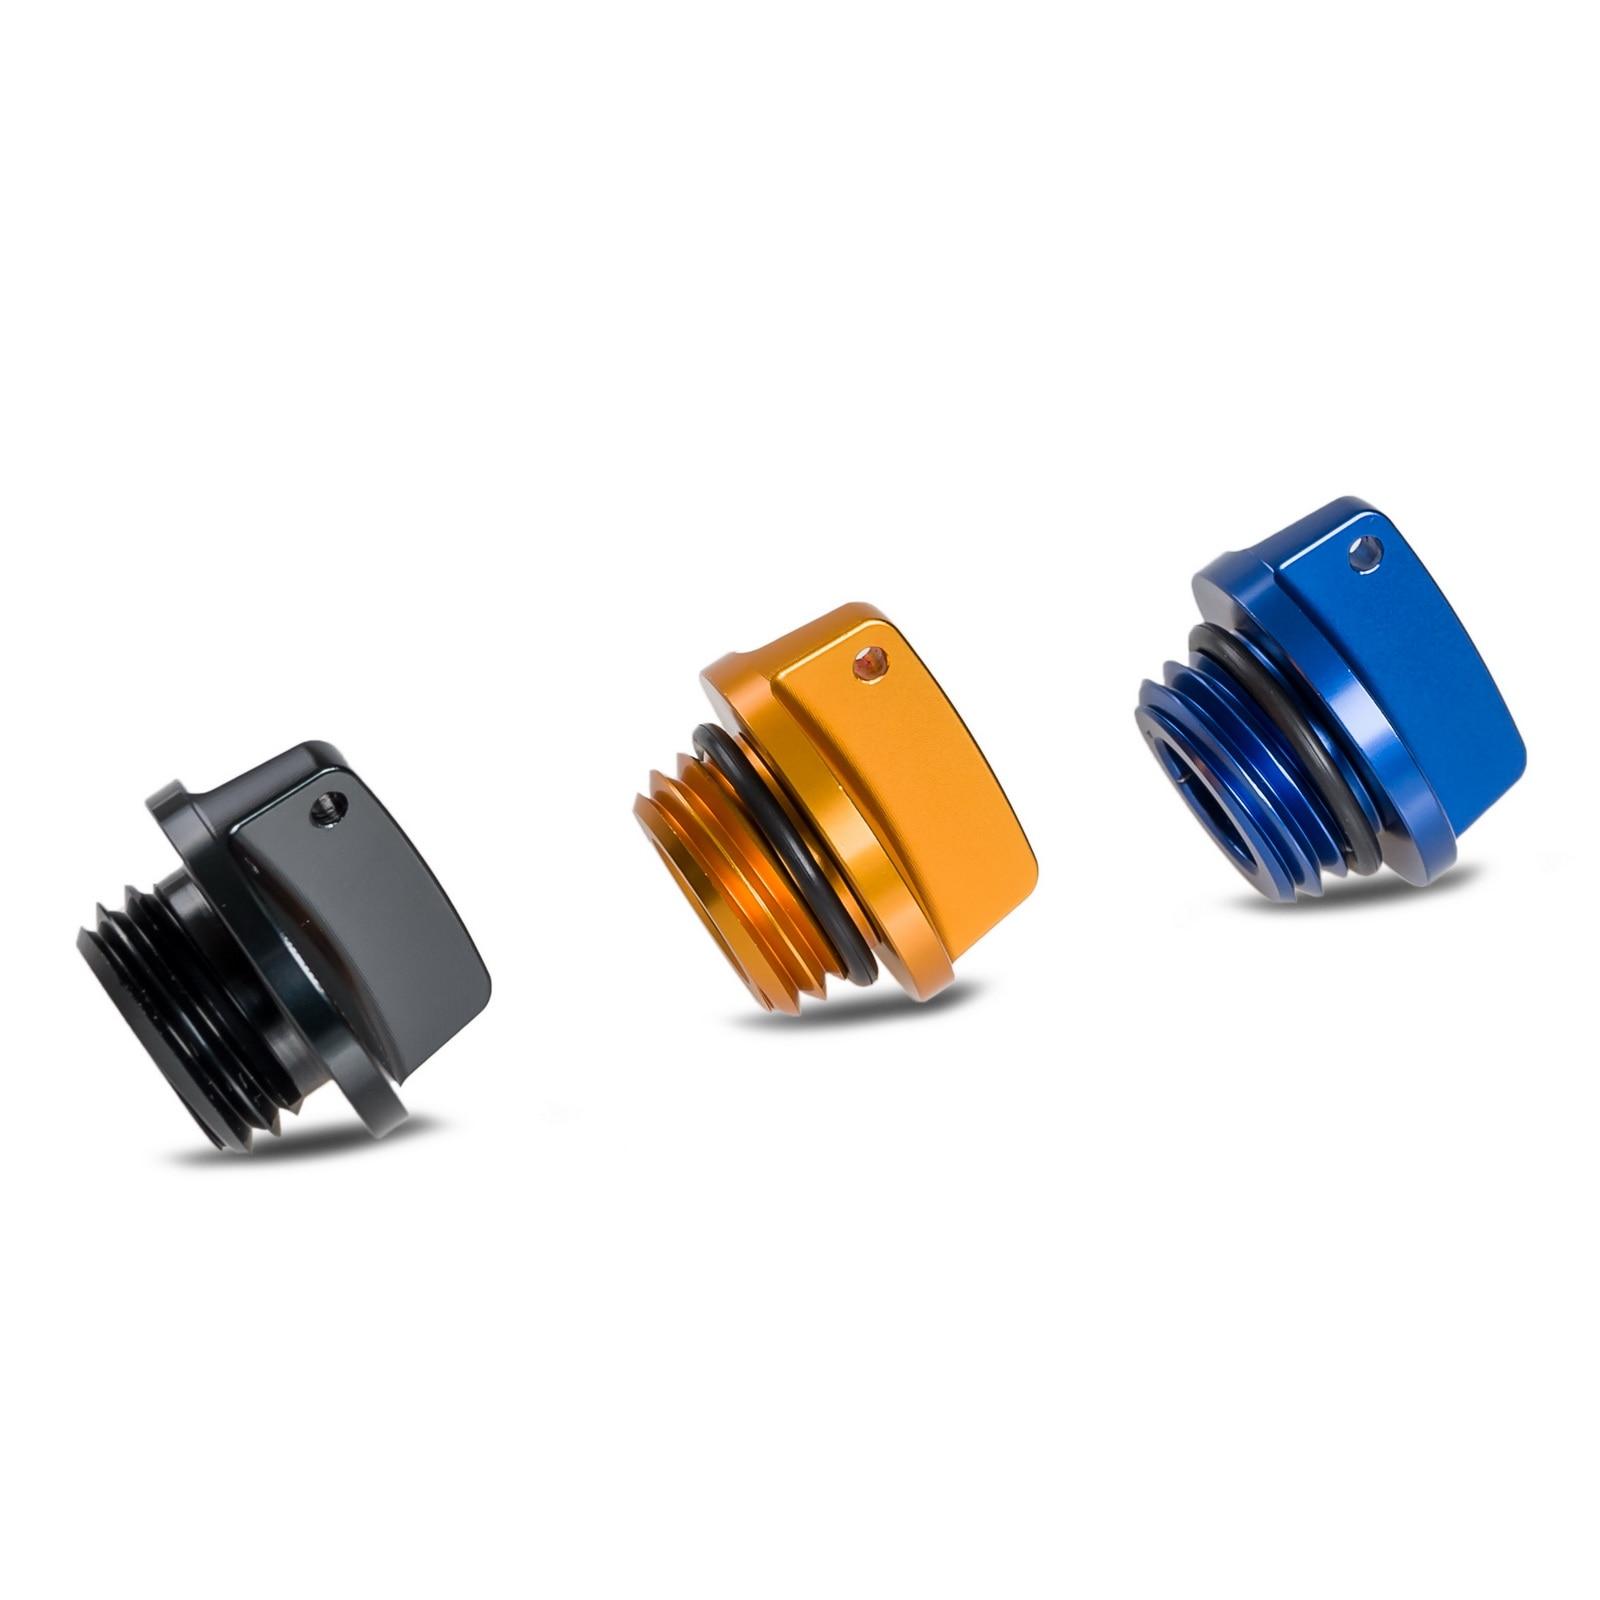 NICECNC Motorcycles Oil Filler Cap Plug For Yamaha R1 R3 R6 FZ1 FZ6/R FZ07 FZ8 FJR1300 MT01 MT07 YFM600 FZR FZS TDM XVS650 TZ250